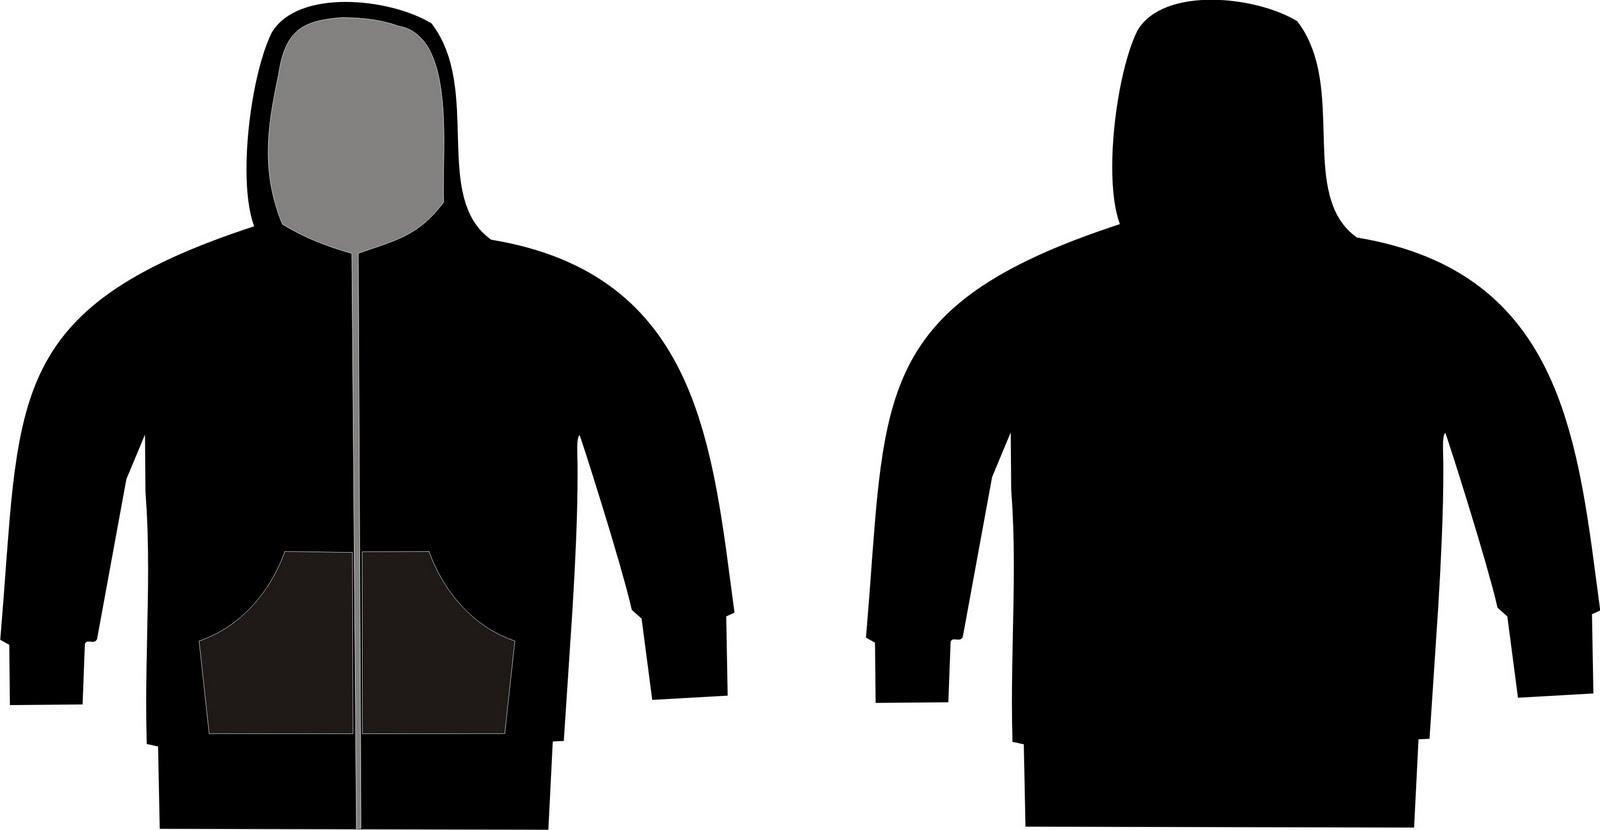 Terbaru Mentahan Jaket Polos Depan Belakang Sablon Kaos Sablon Kaos